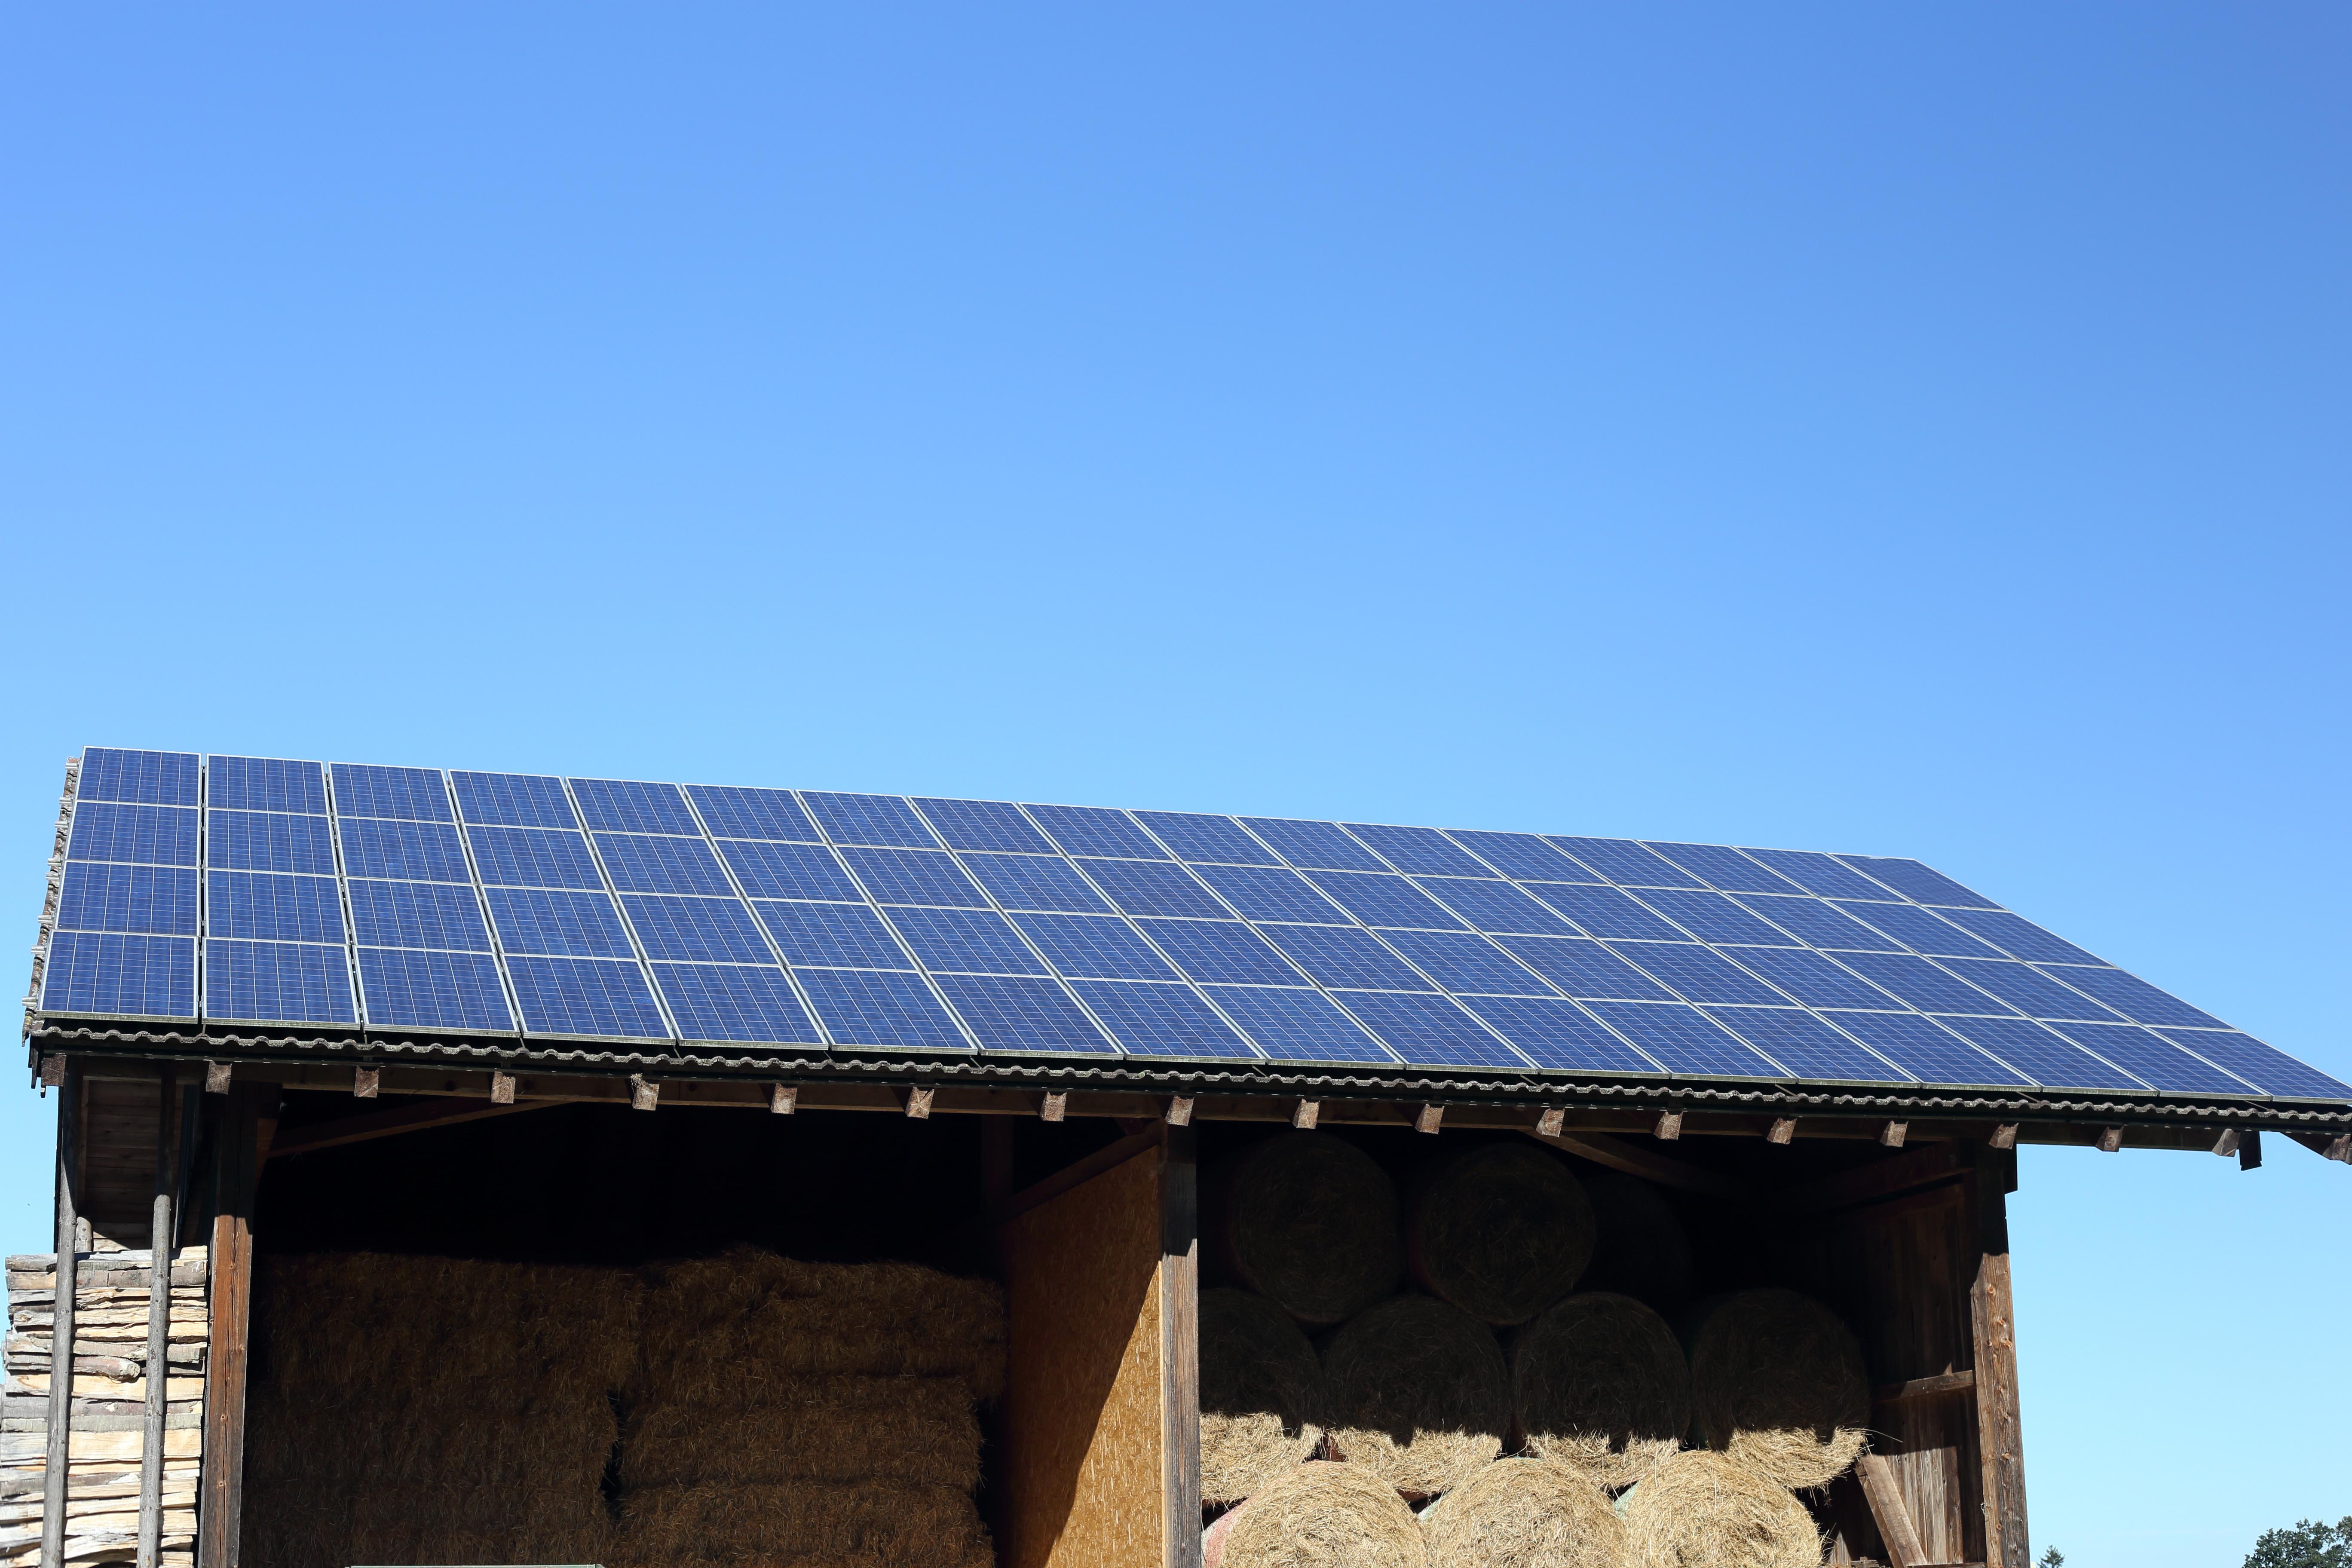 Solar panels on top of barn